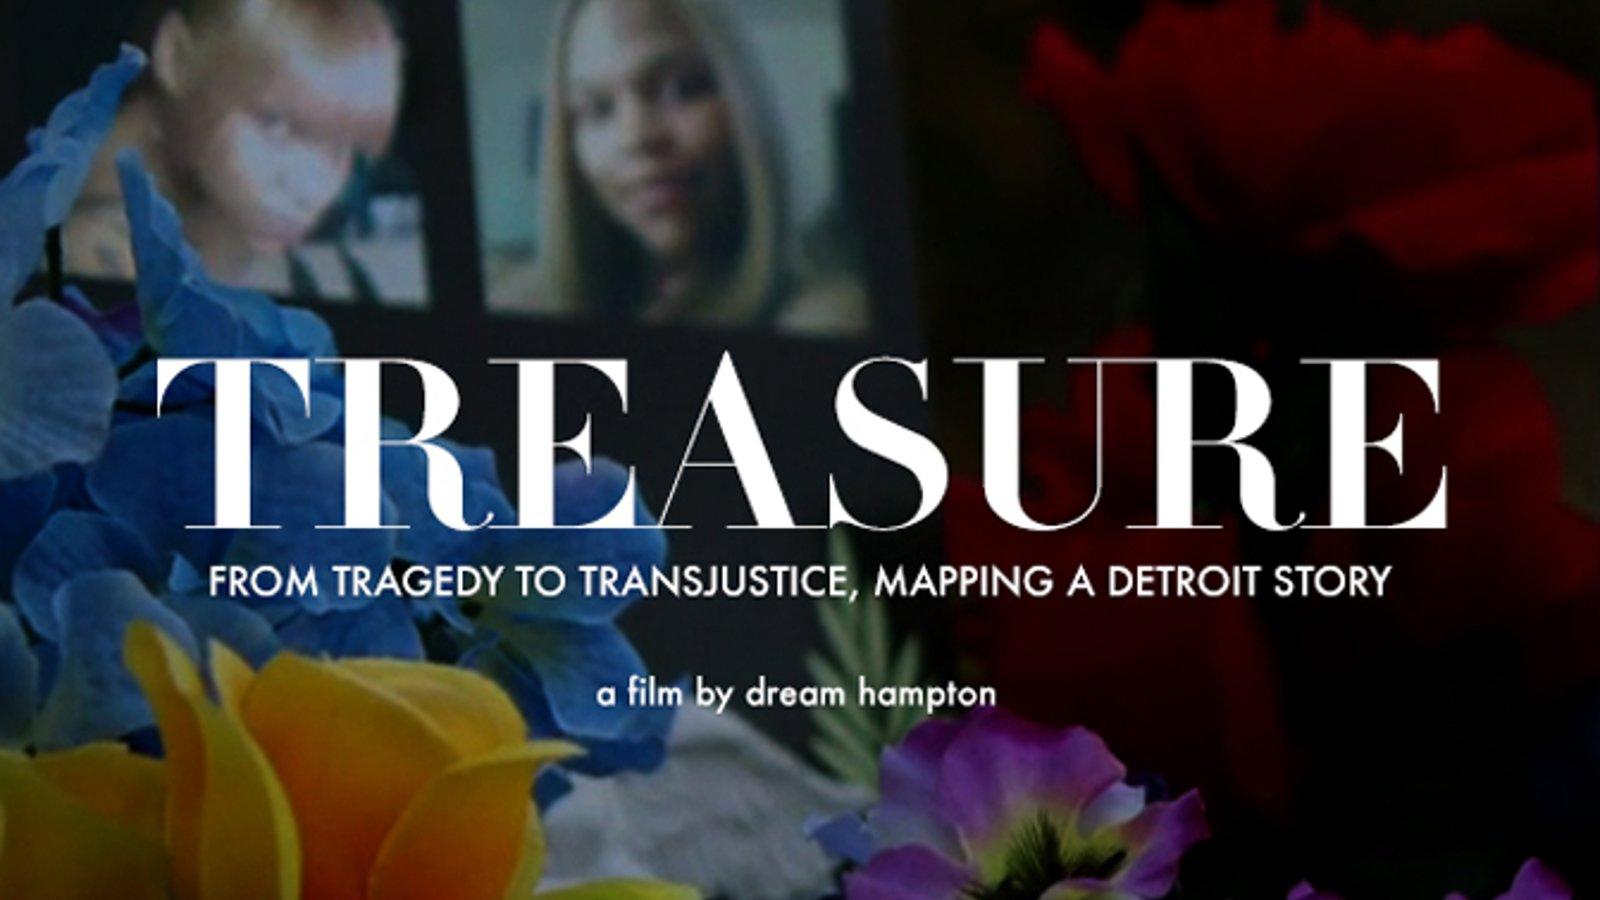 Treasure - Hate Crimes Against the Transgender Community